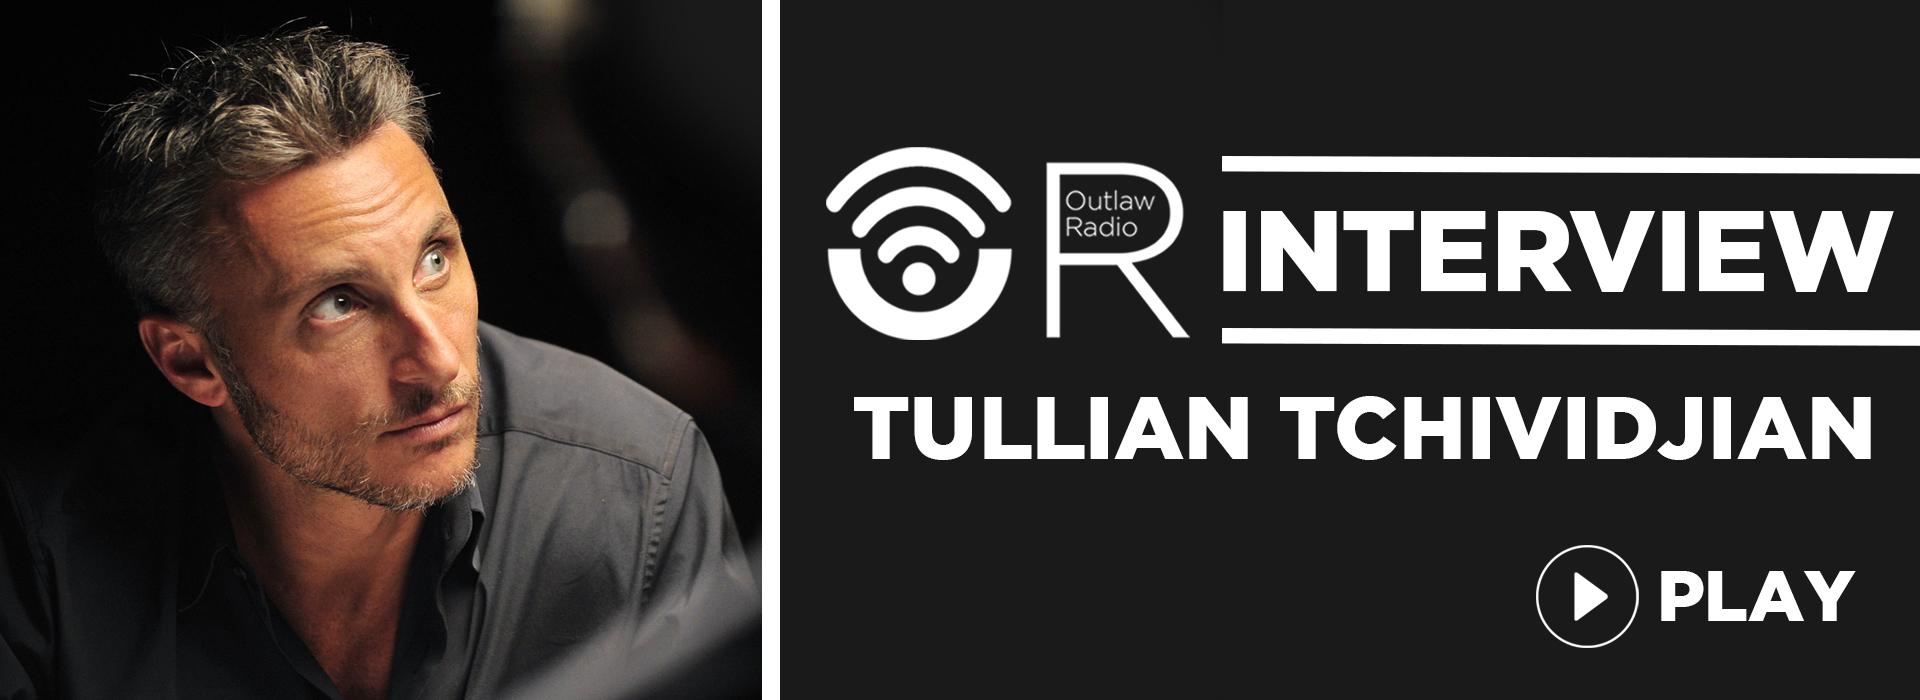 tullian-tchividjian